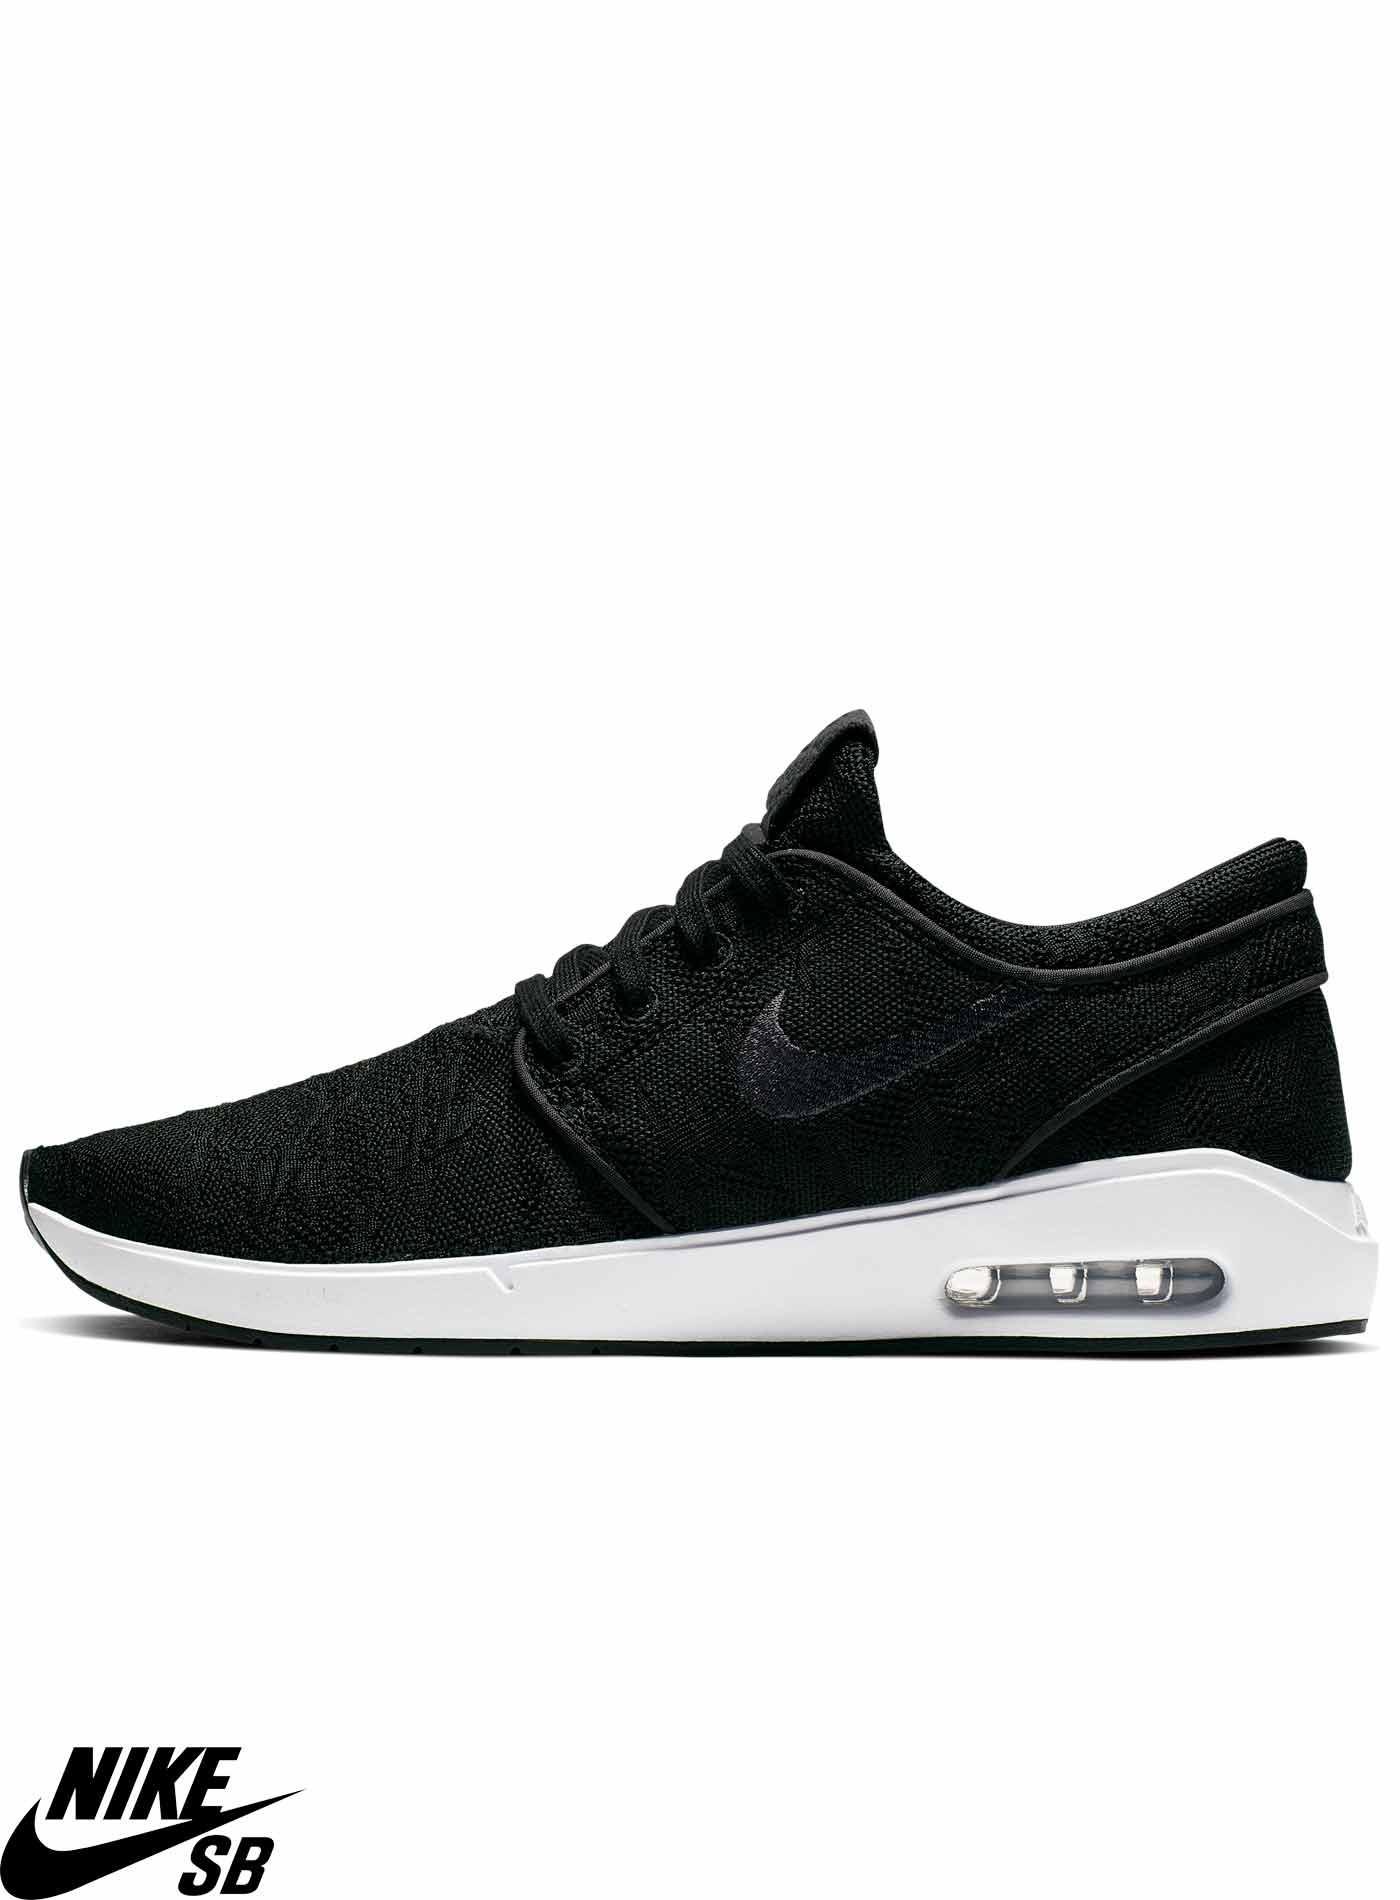 Mens Black Skate Shoes Nike SB Janoski Air Max Mid Anthracite Black & White Skate Shoes Black D Treads